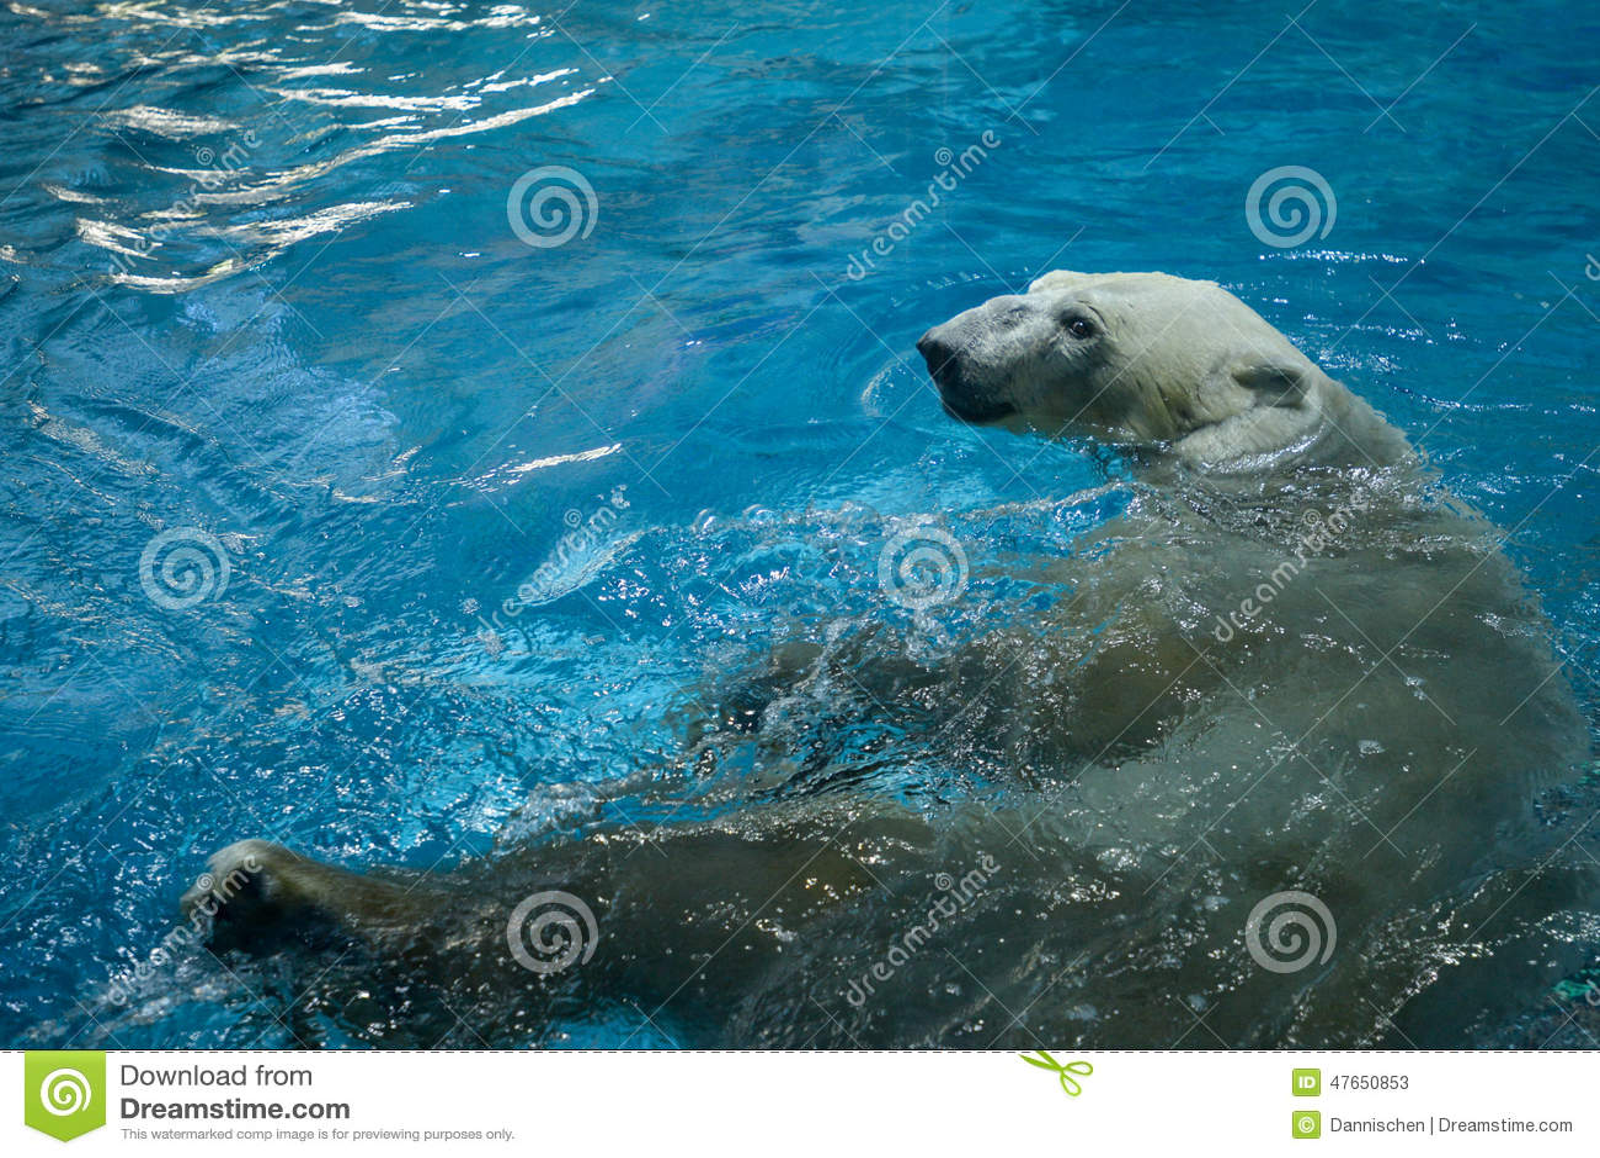 Polar bear swimming in ocean - photo#28